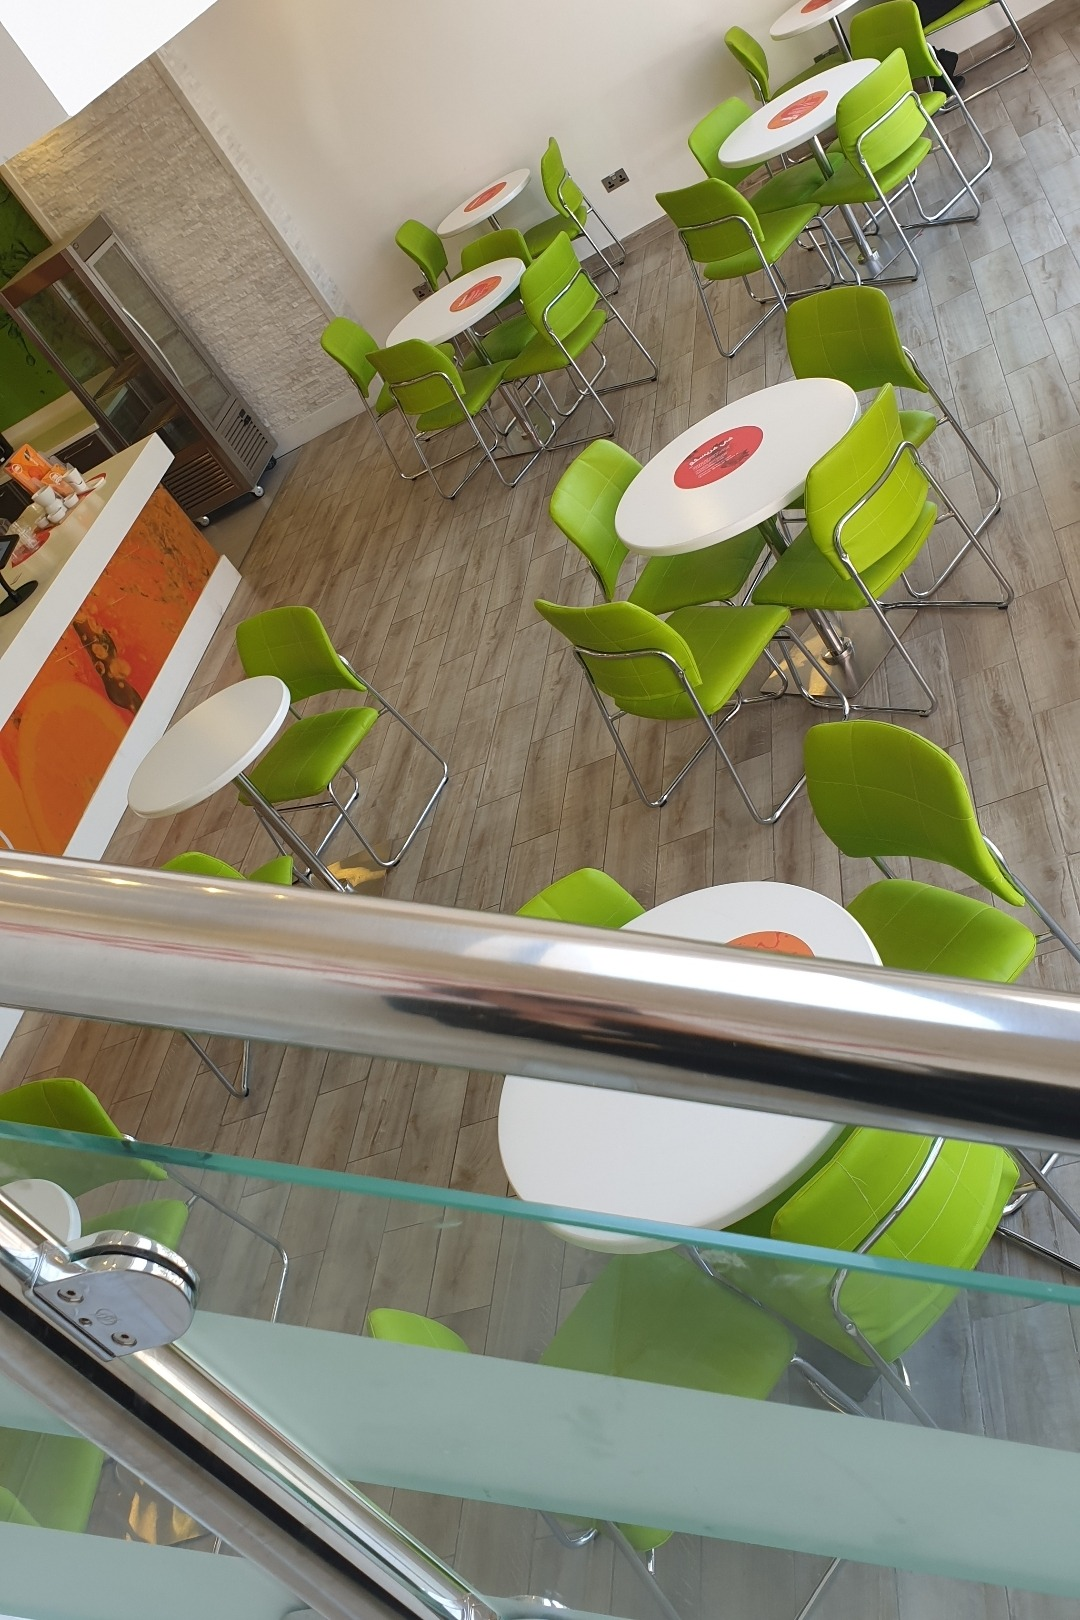 Fresco Juice Bar & Cafe - Bahrain